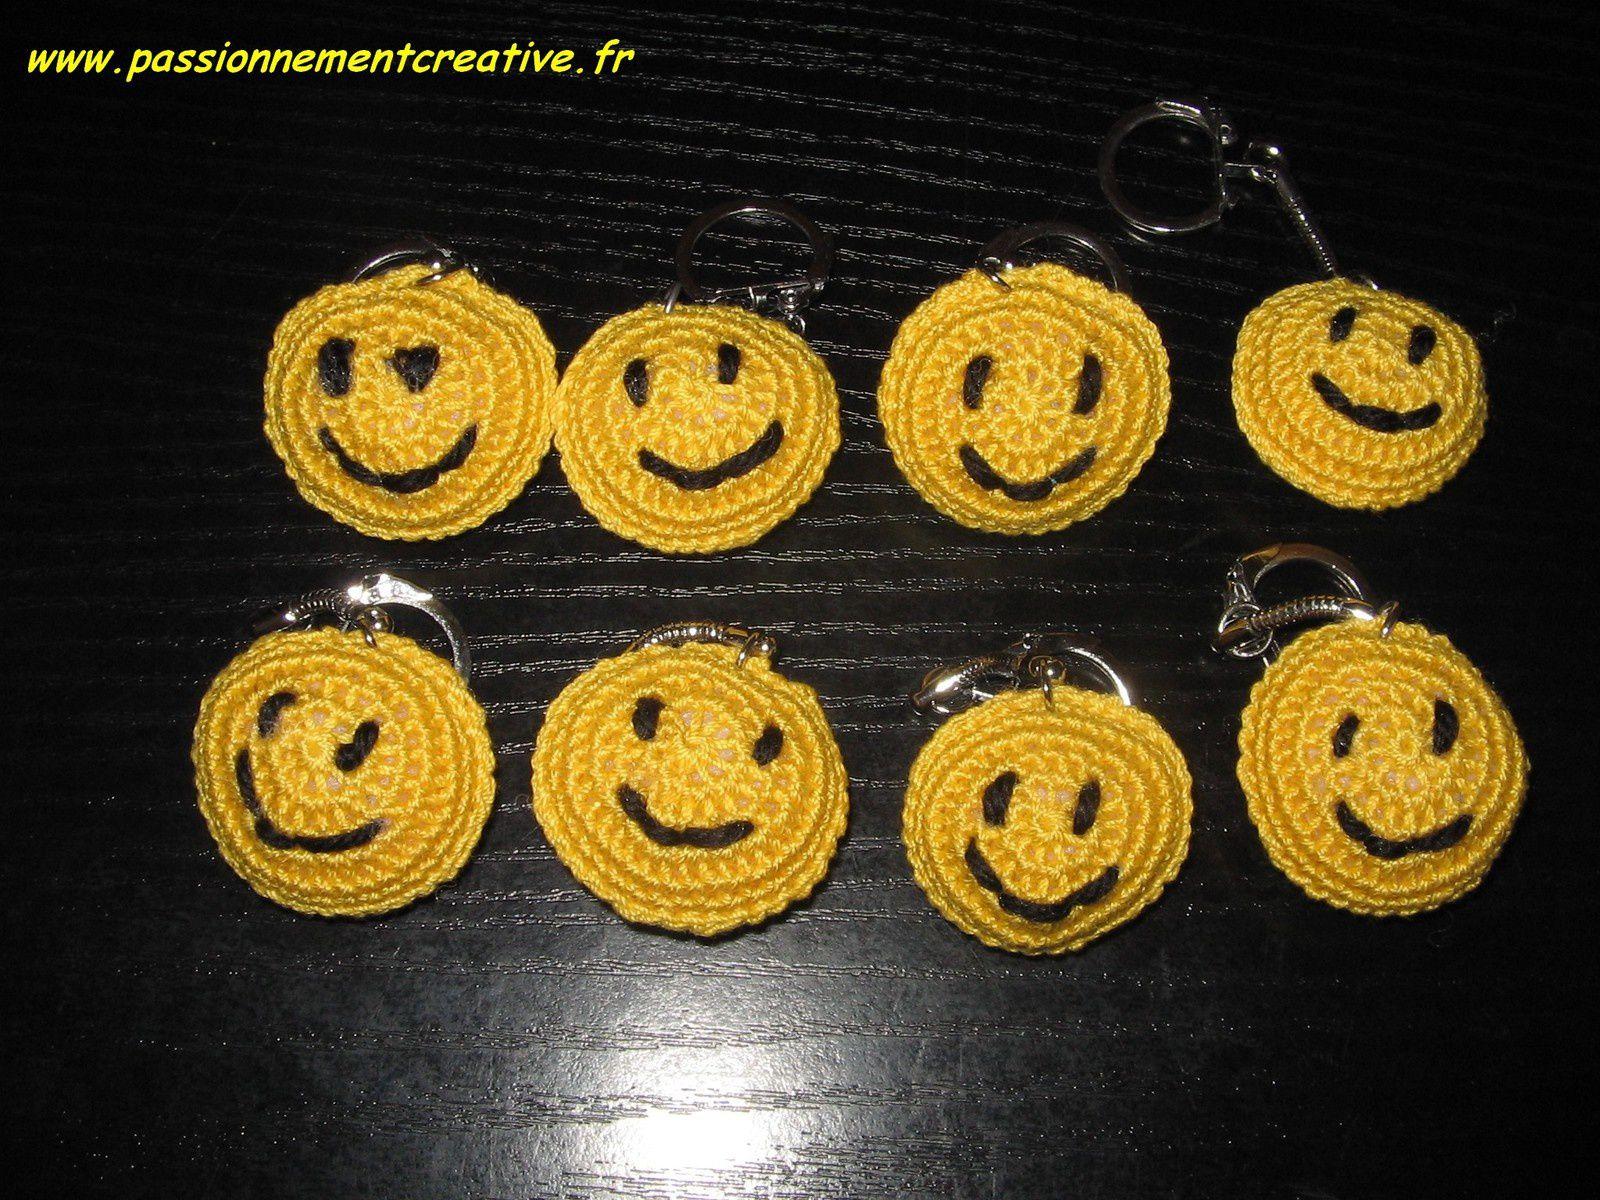 Smiley jaune en porte-clés